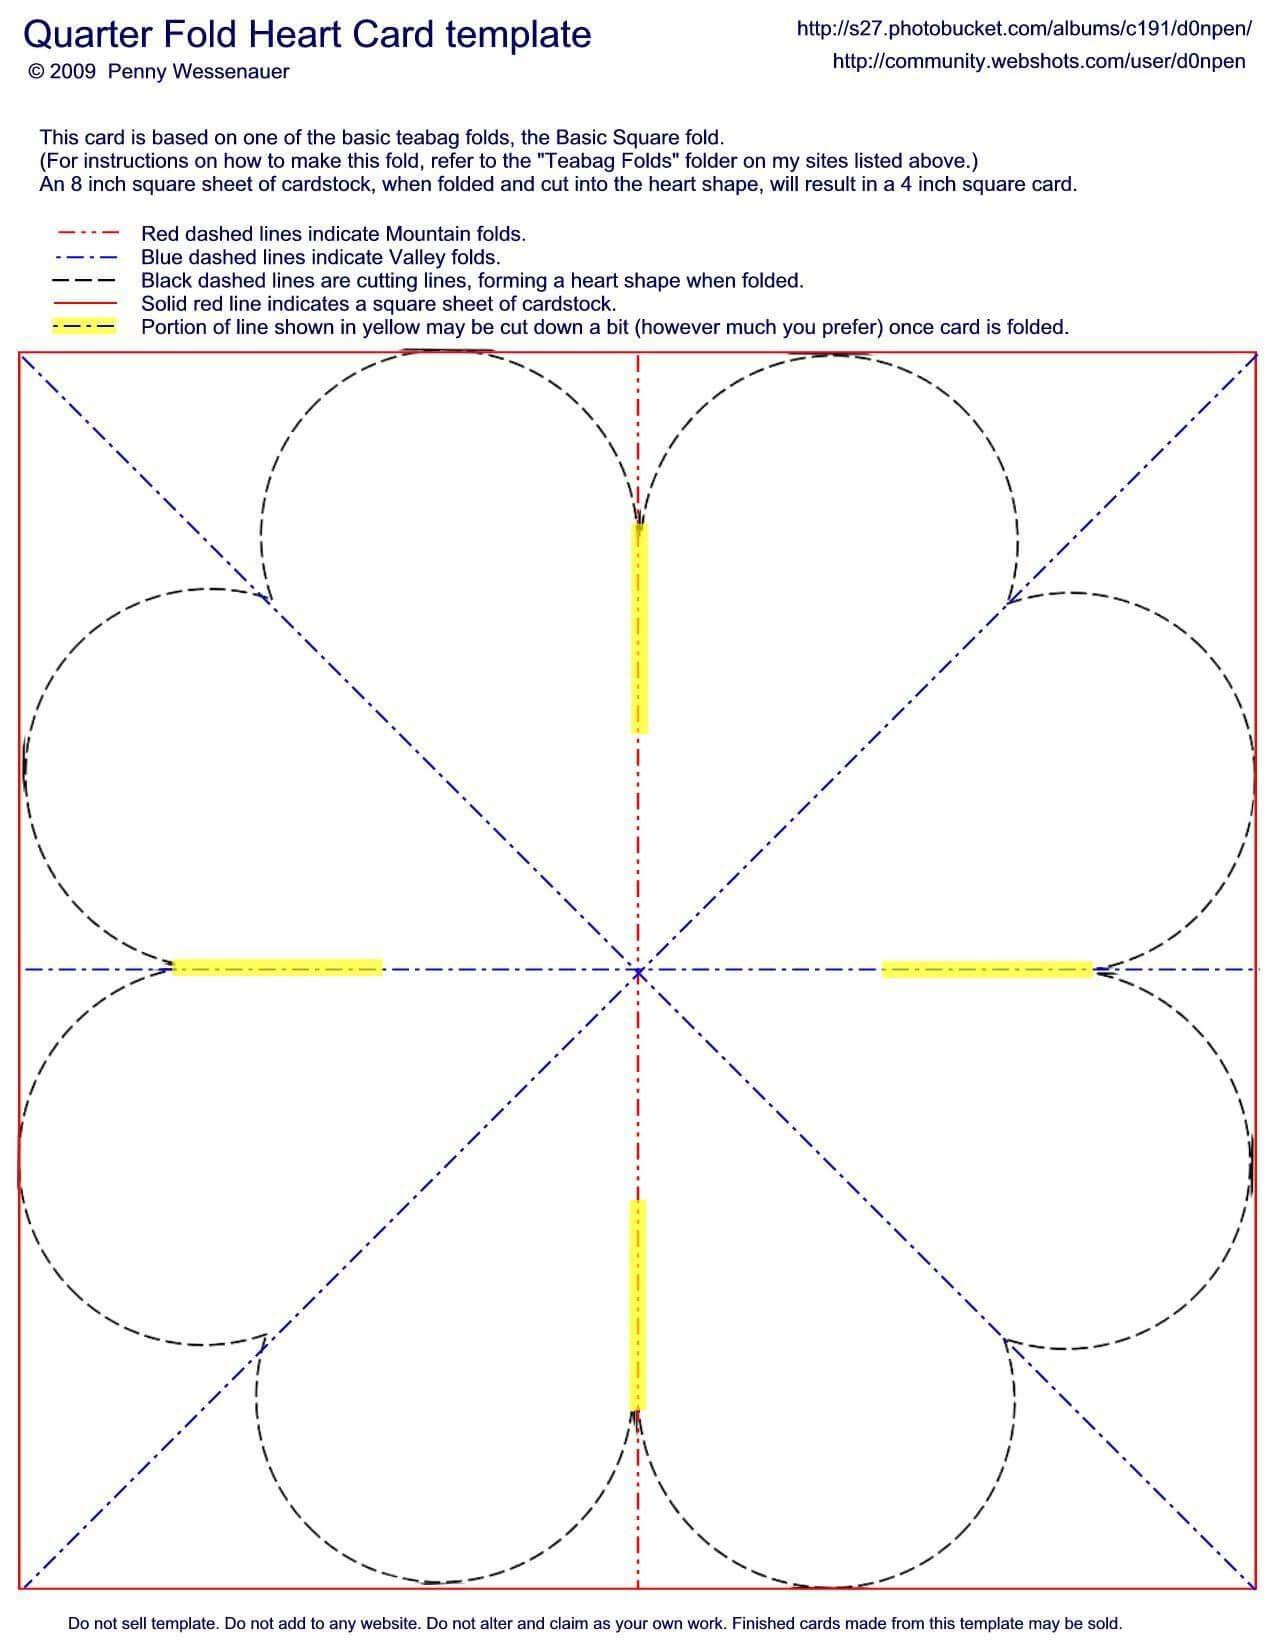 Quarter-Fold Heart Card Template | Valentines | Heart Cards intended for Quarter Fold Card Template